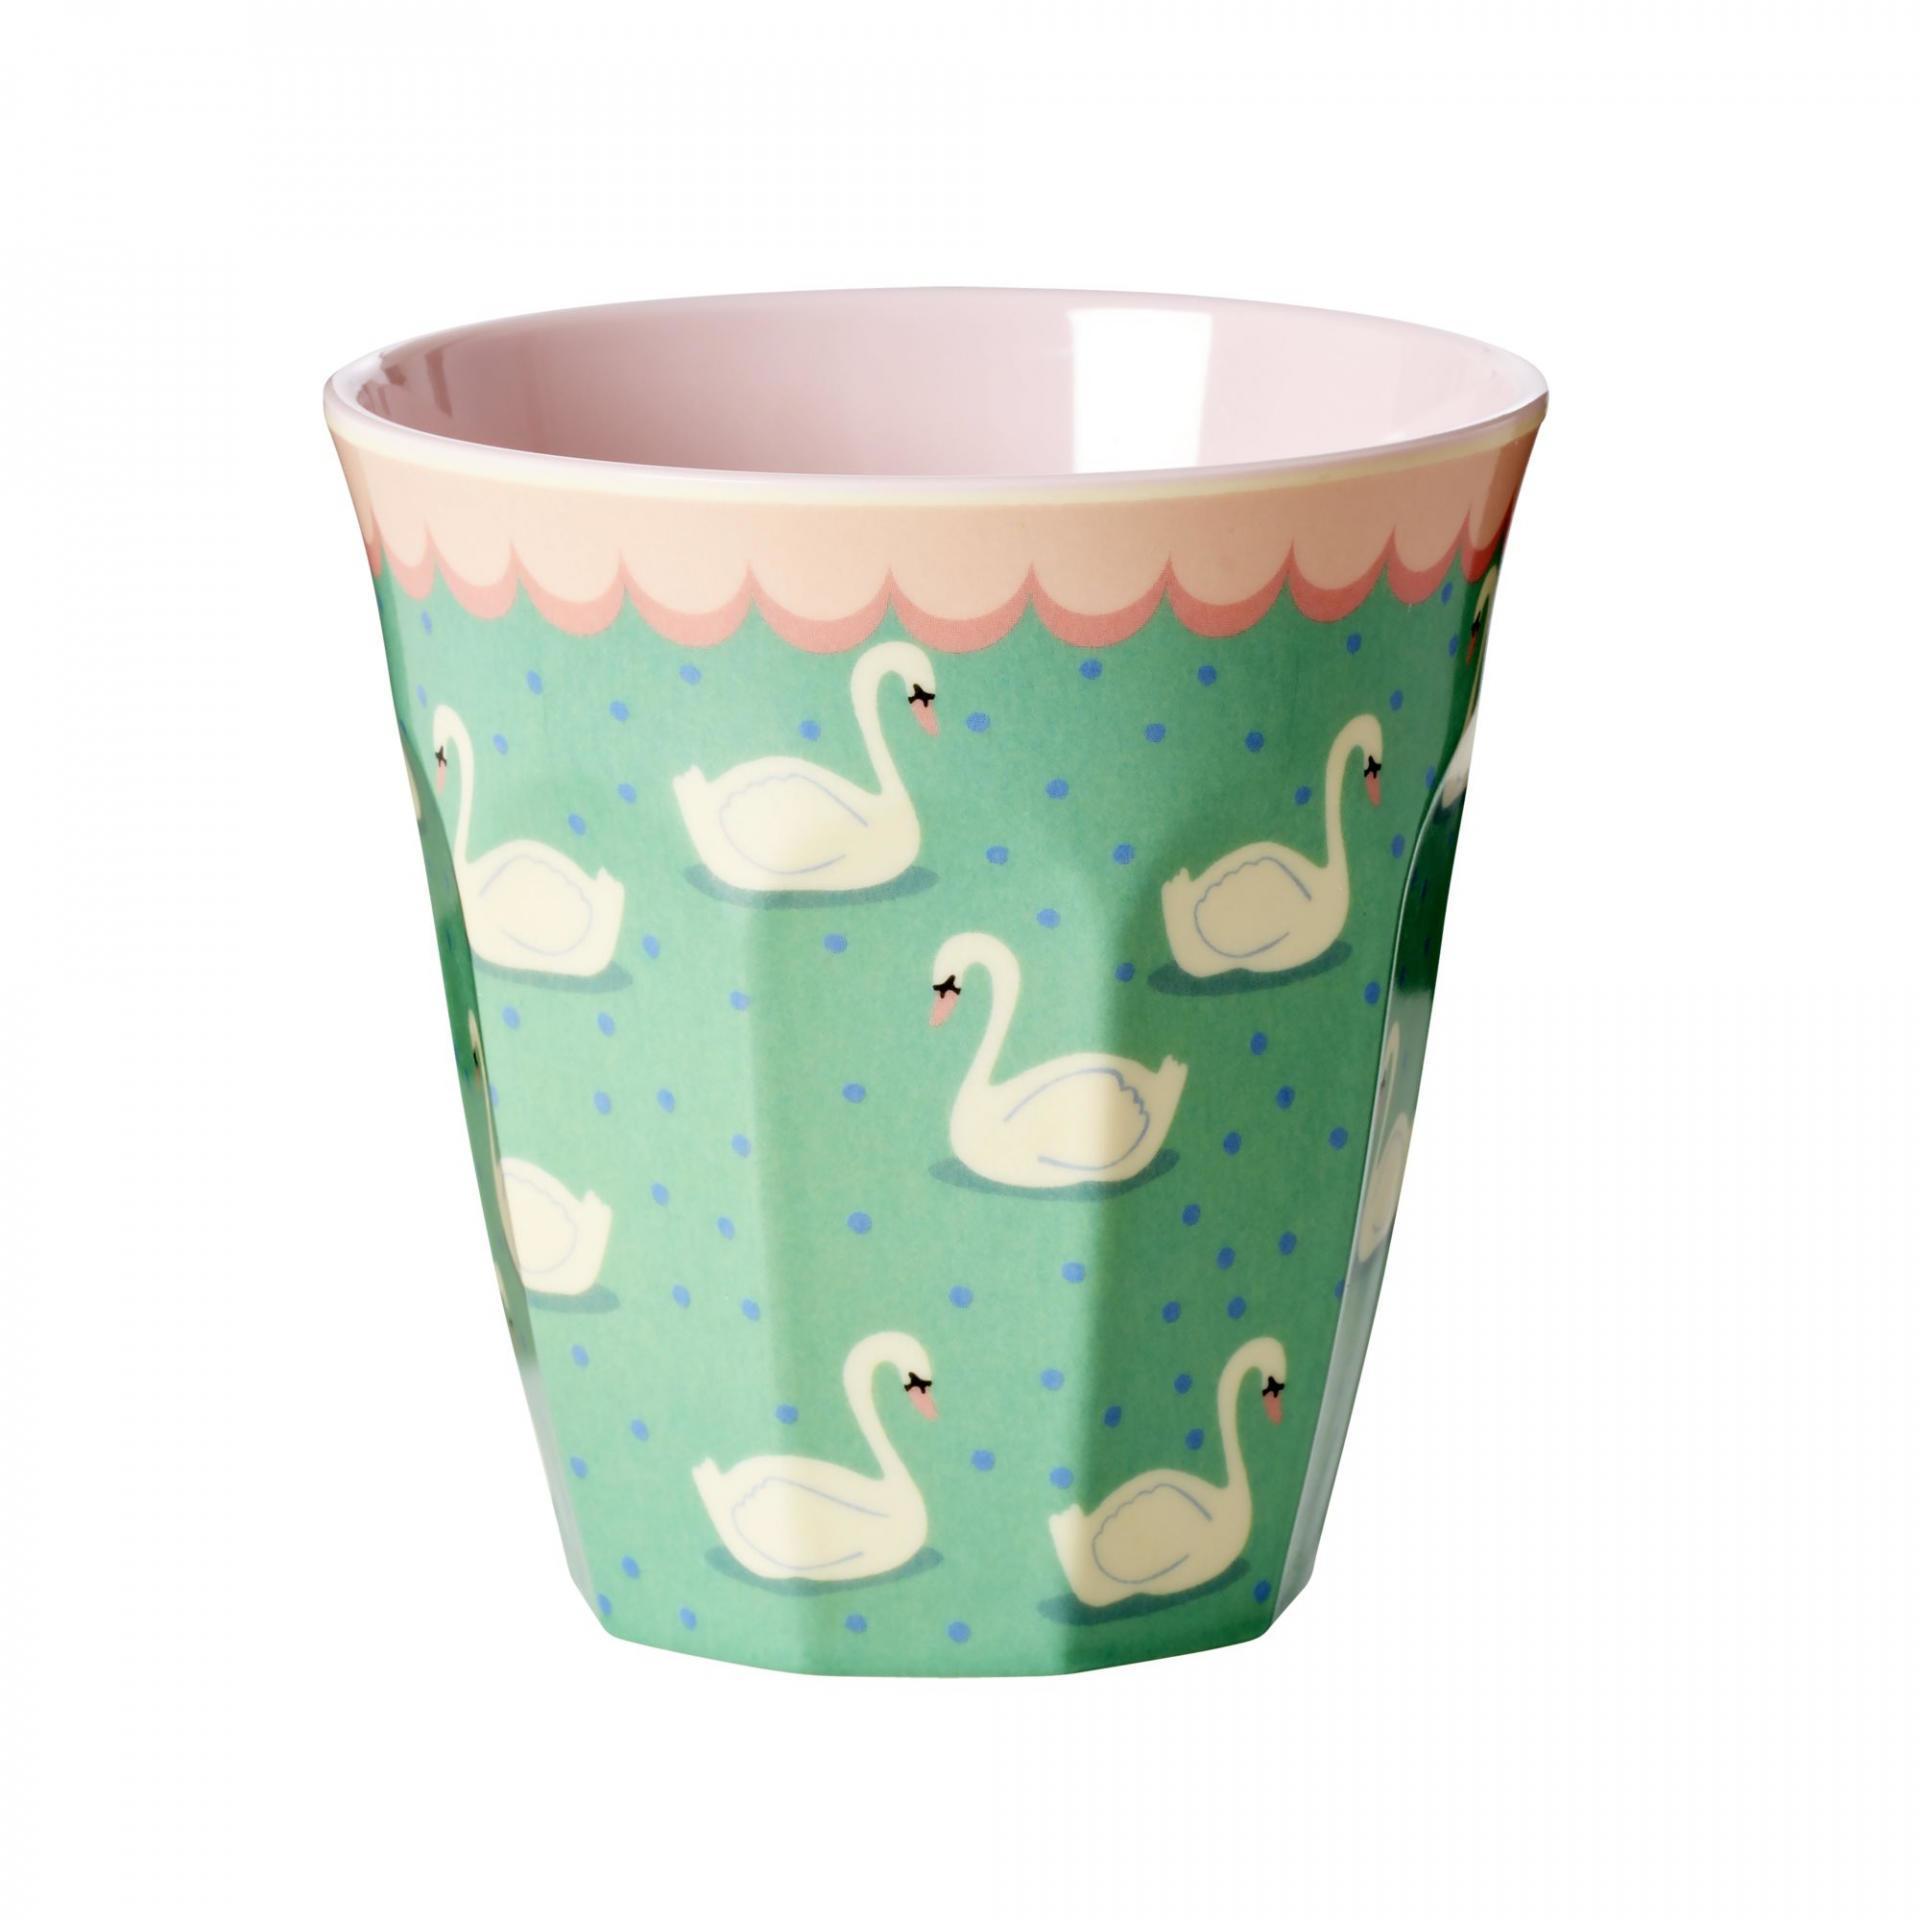 rice Melaminový pohárek Swan, zelená barva, melamin